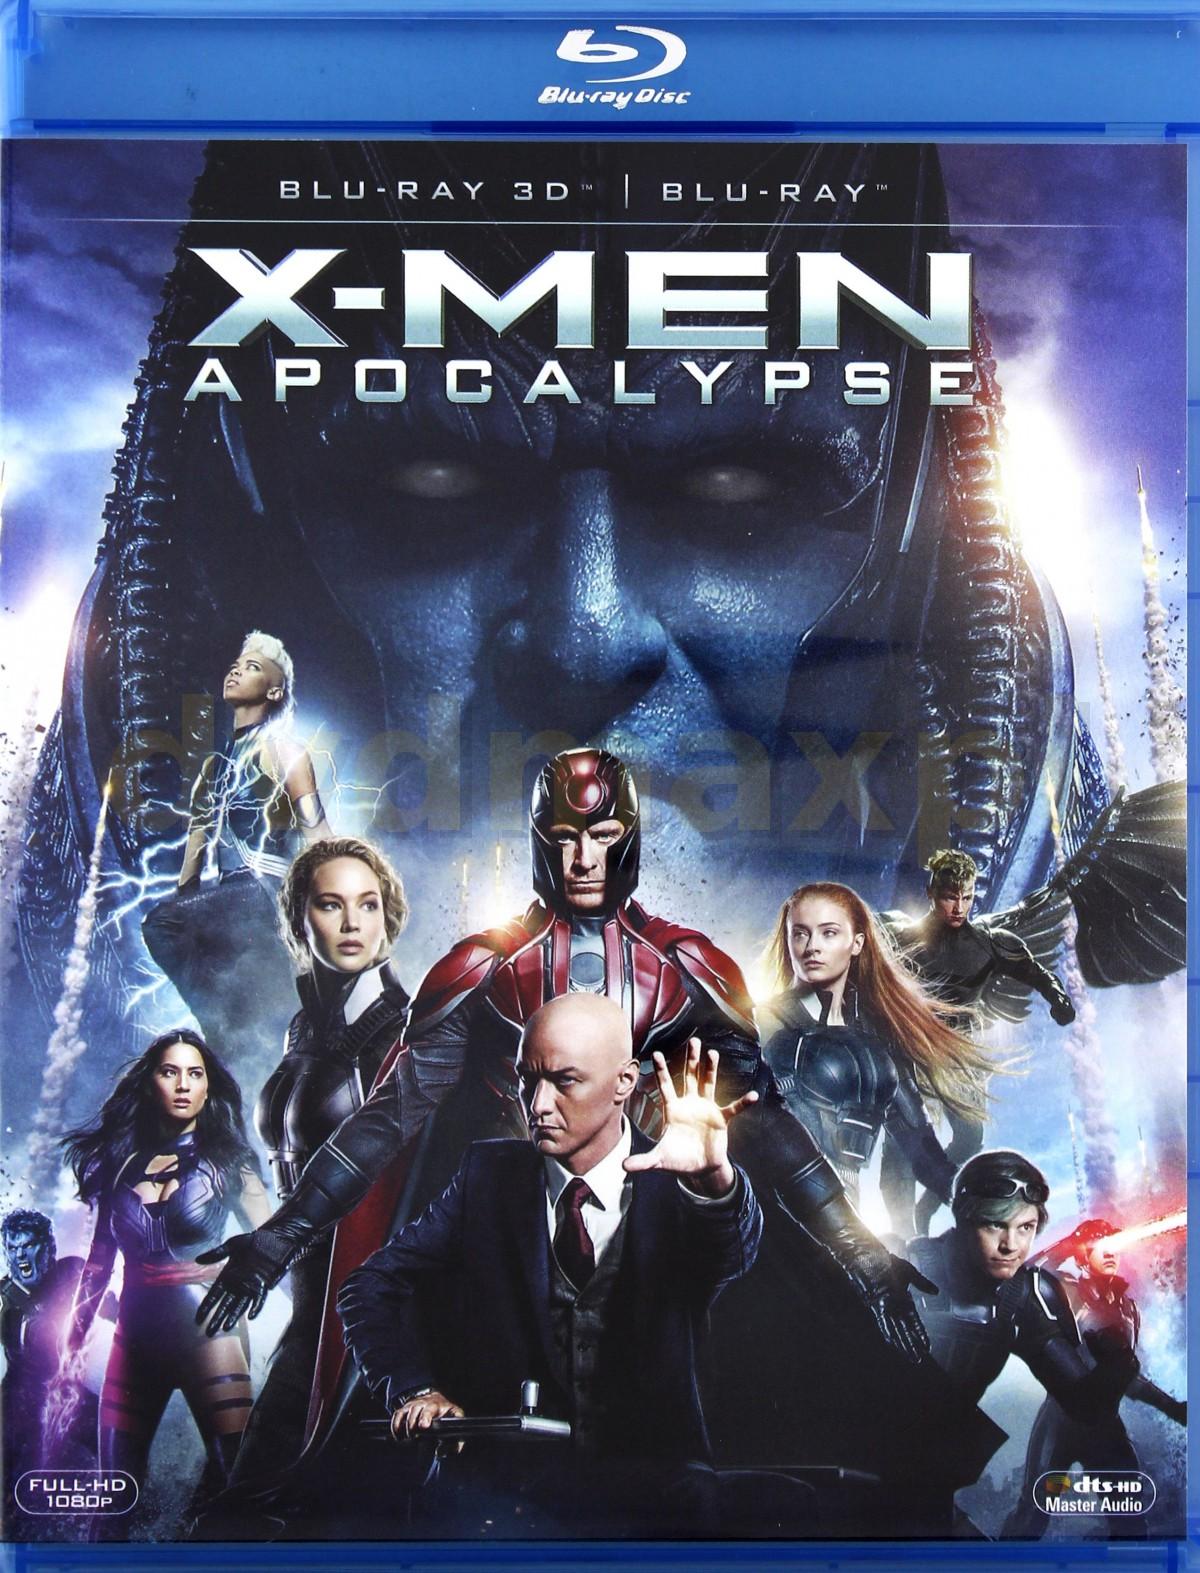 X-Men: Apocalypse [Blu-Ray 3D]+[Blu-Ray]